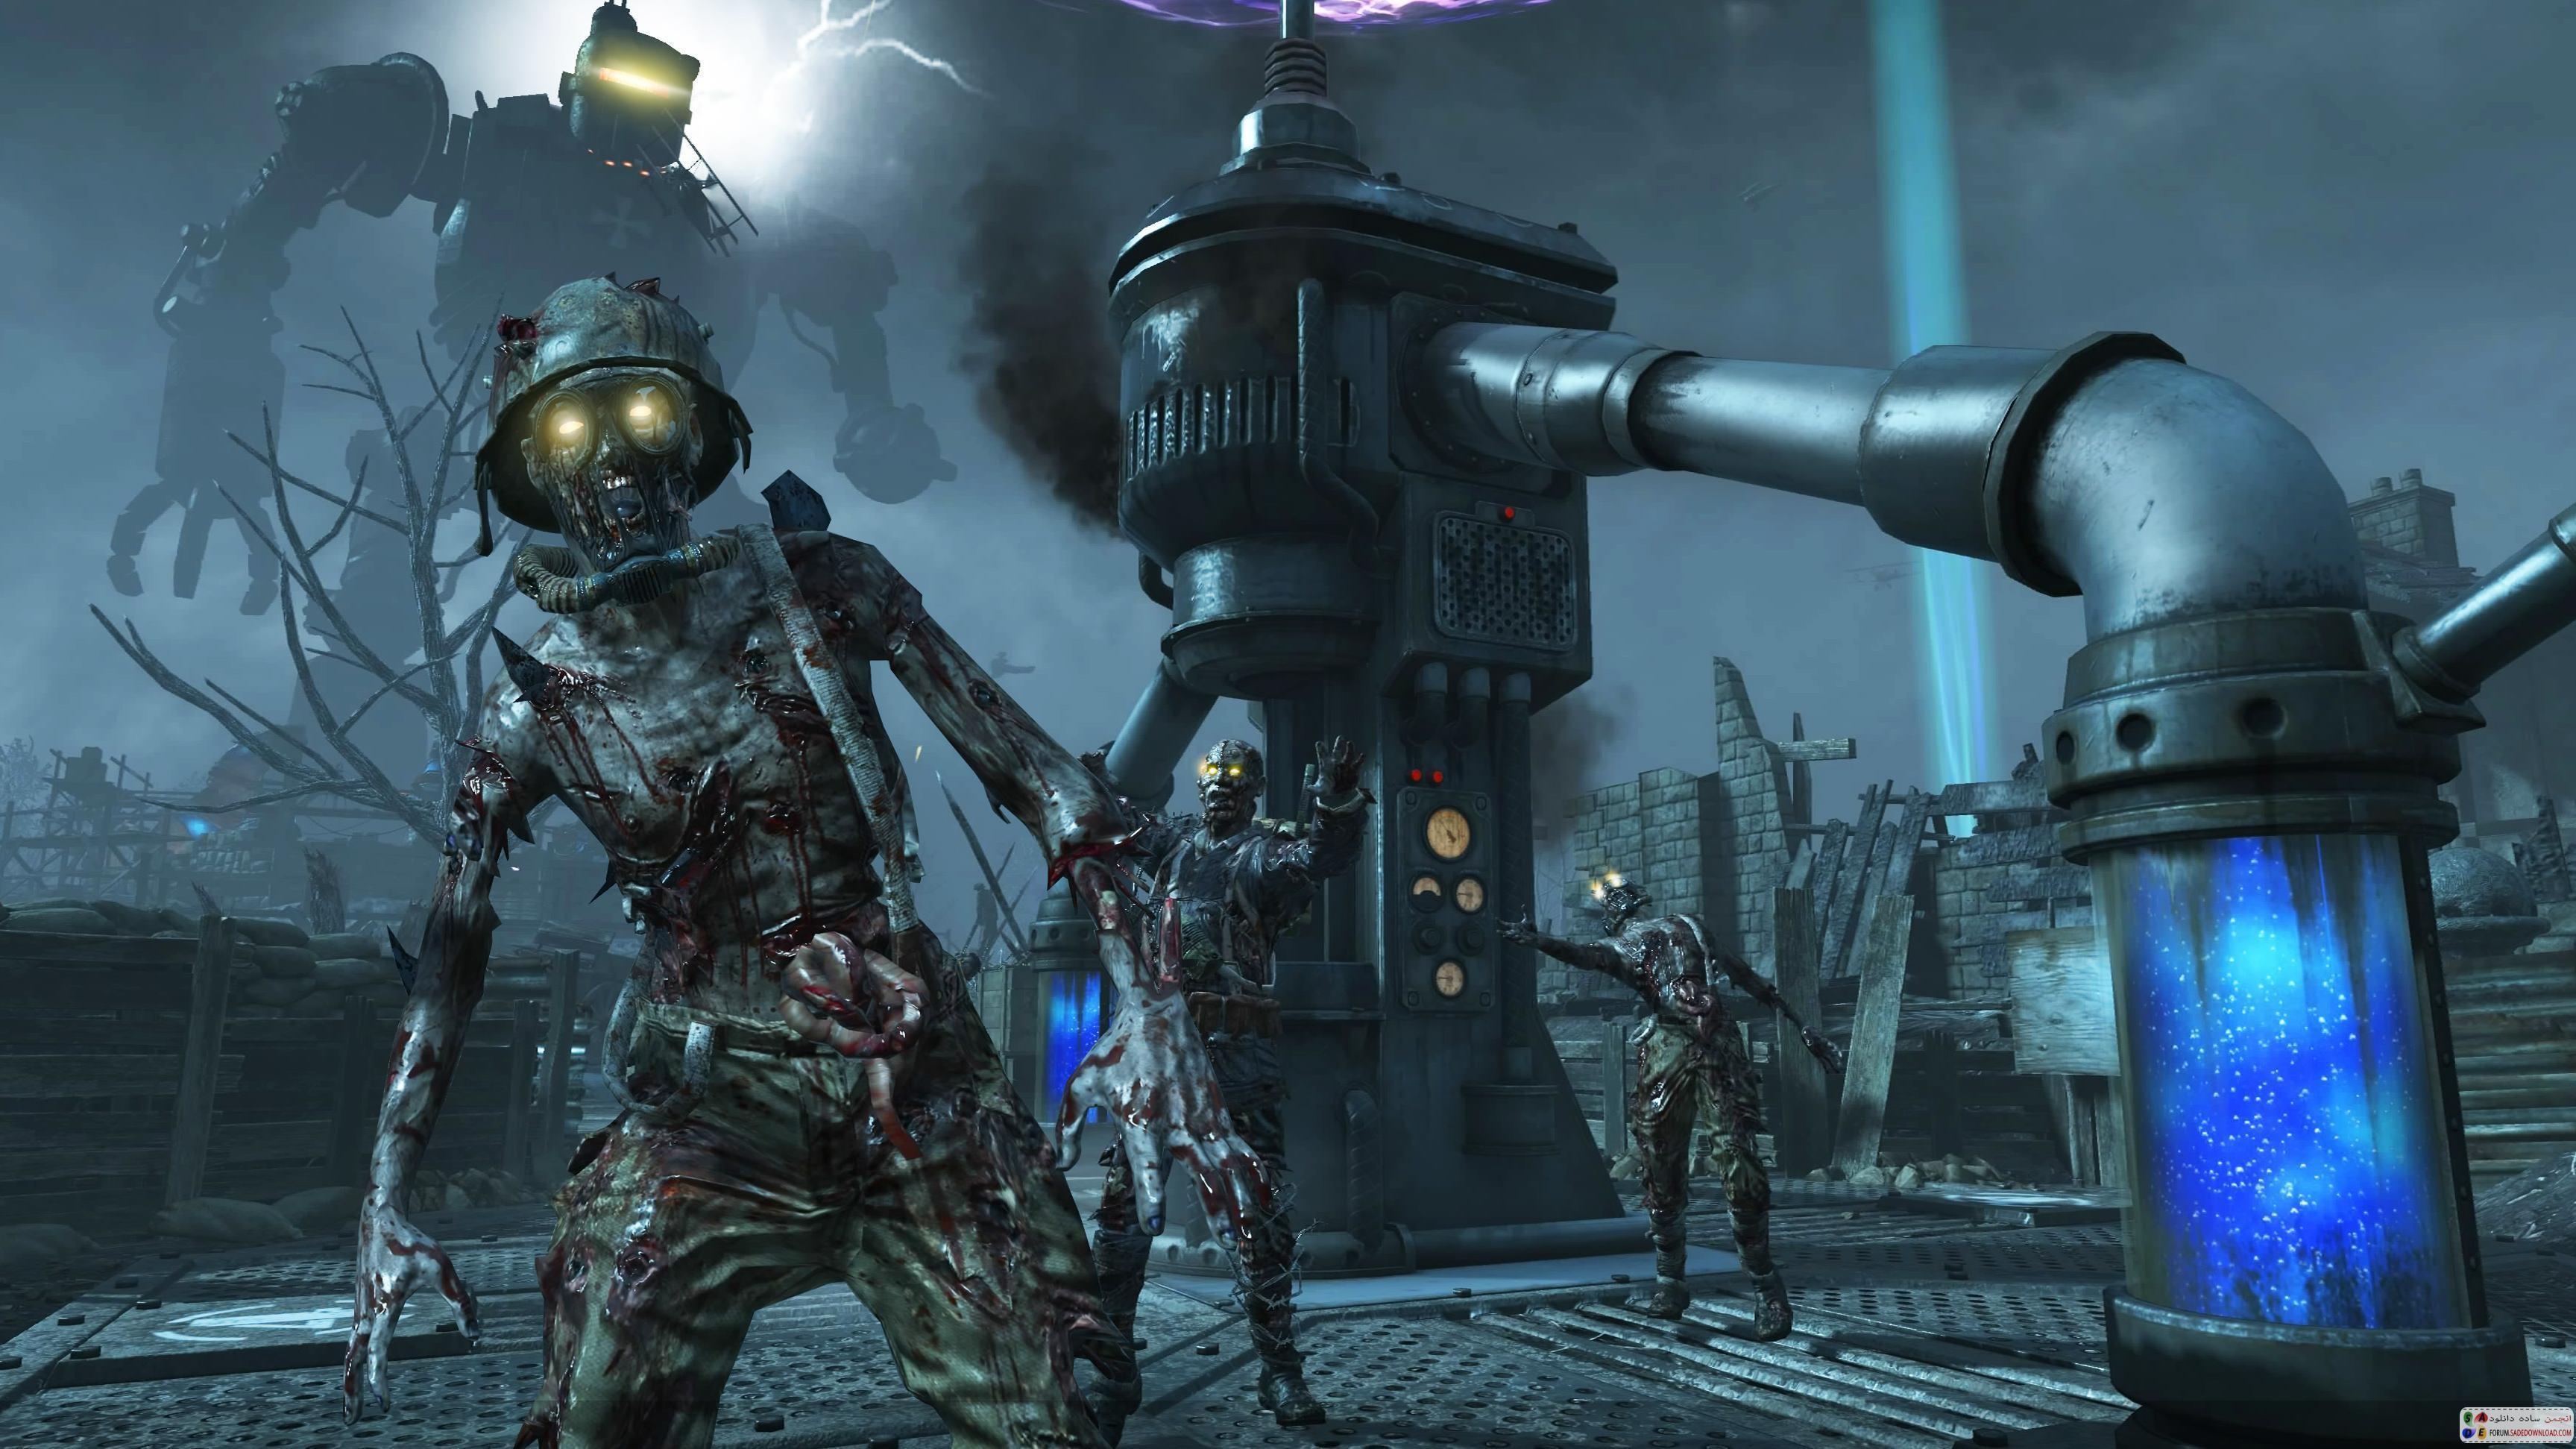 Call Of Duty Black Ops 2 Zombies Wallpaper Origins HD Wallpaper .